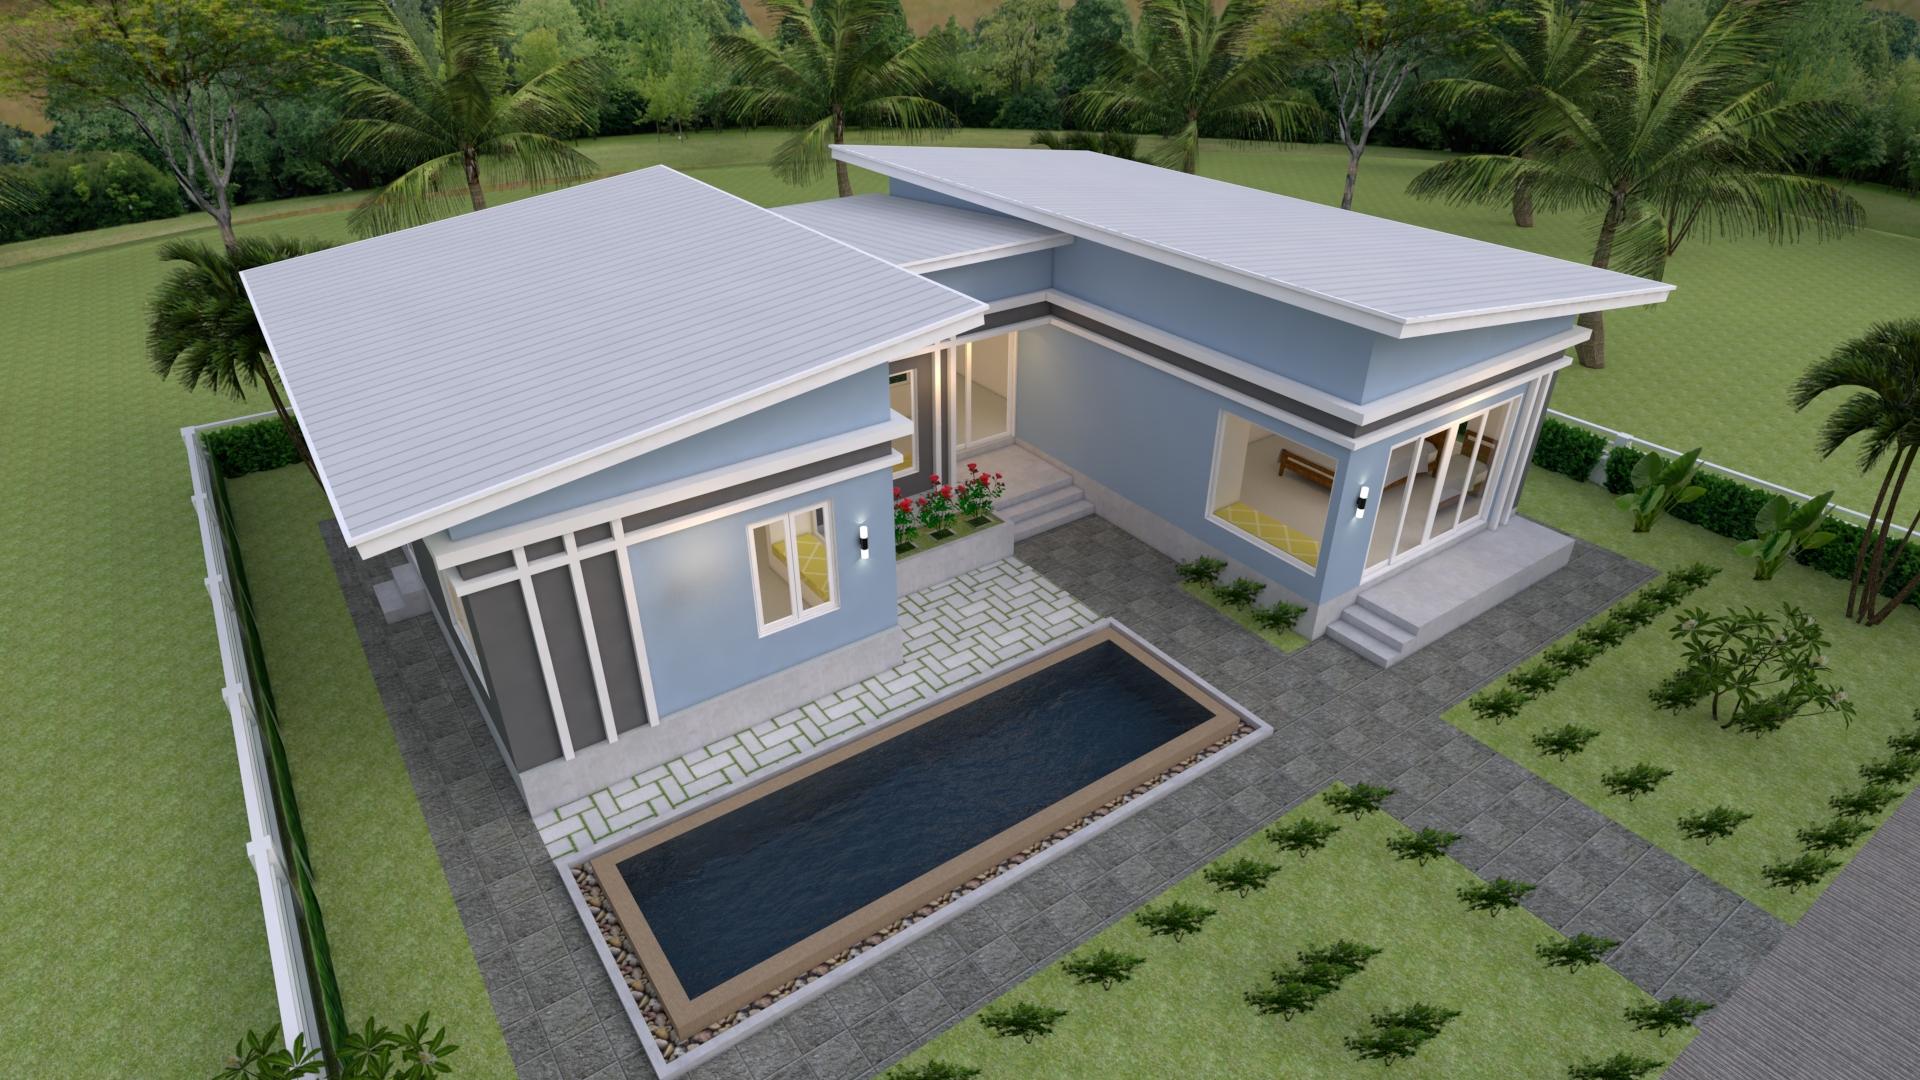 Cool House Plans 15x11 Meter 49x36 Feet 3 Beds 5